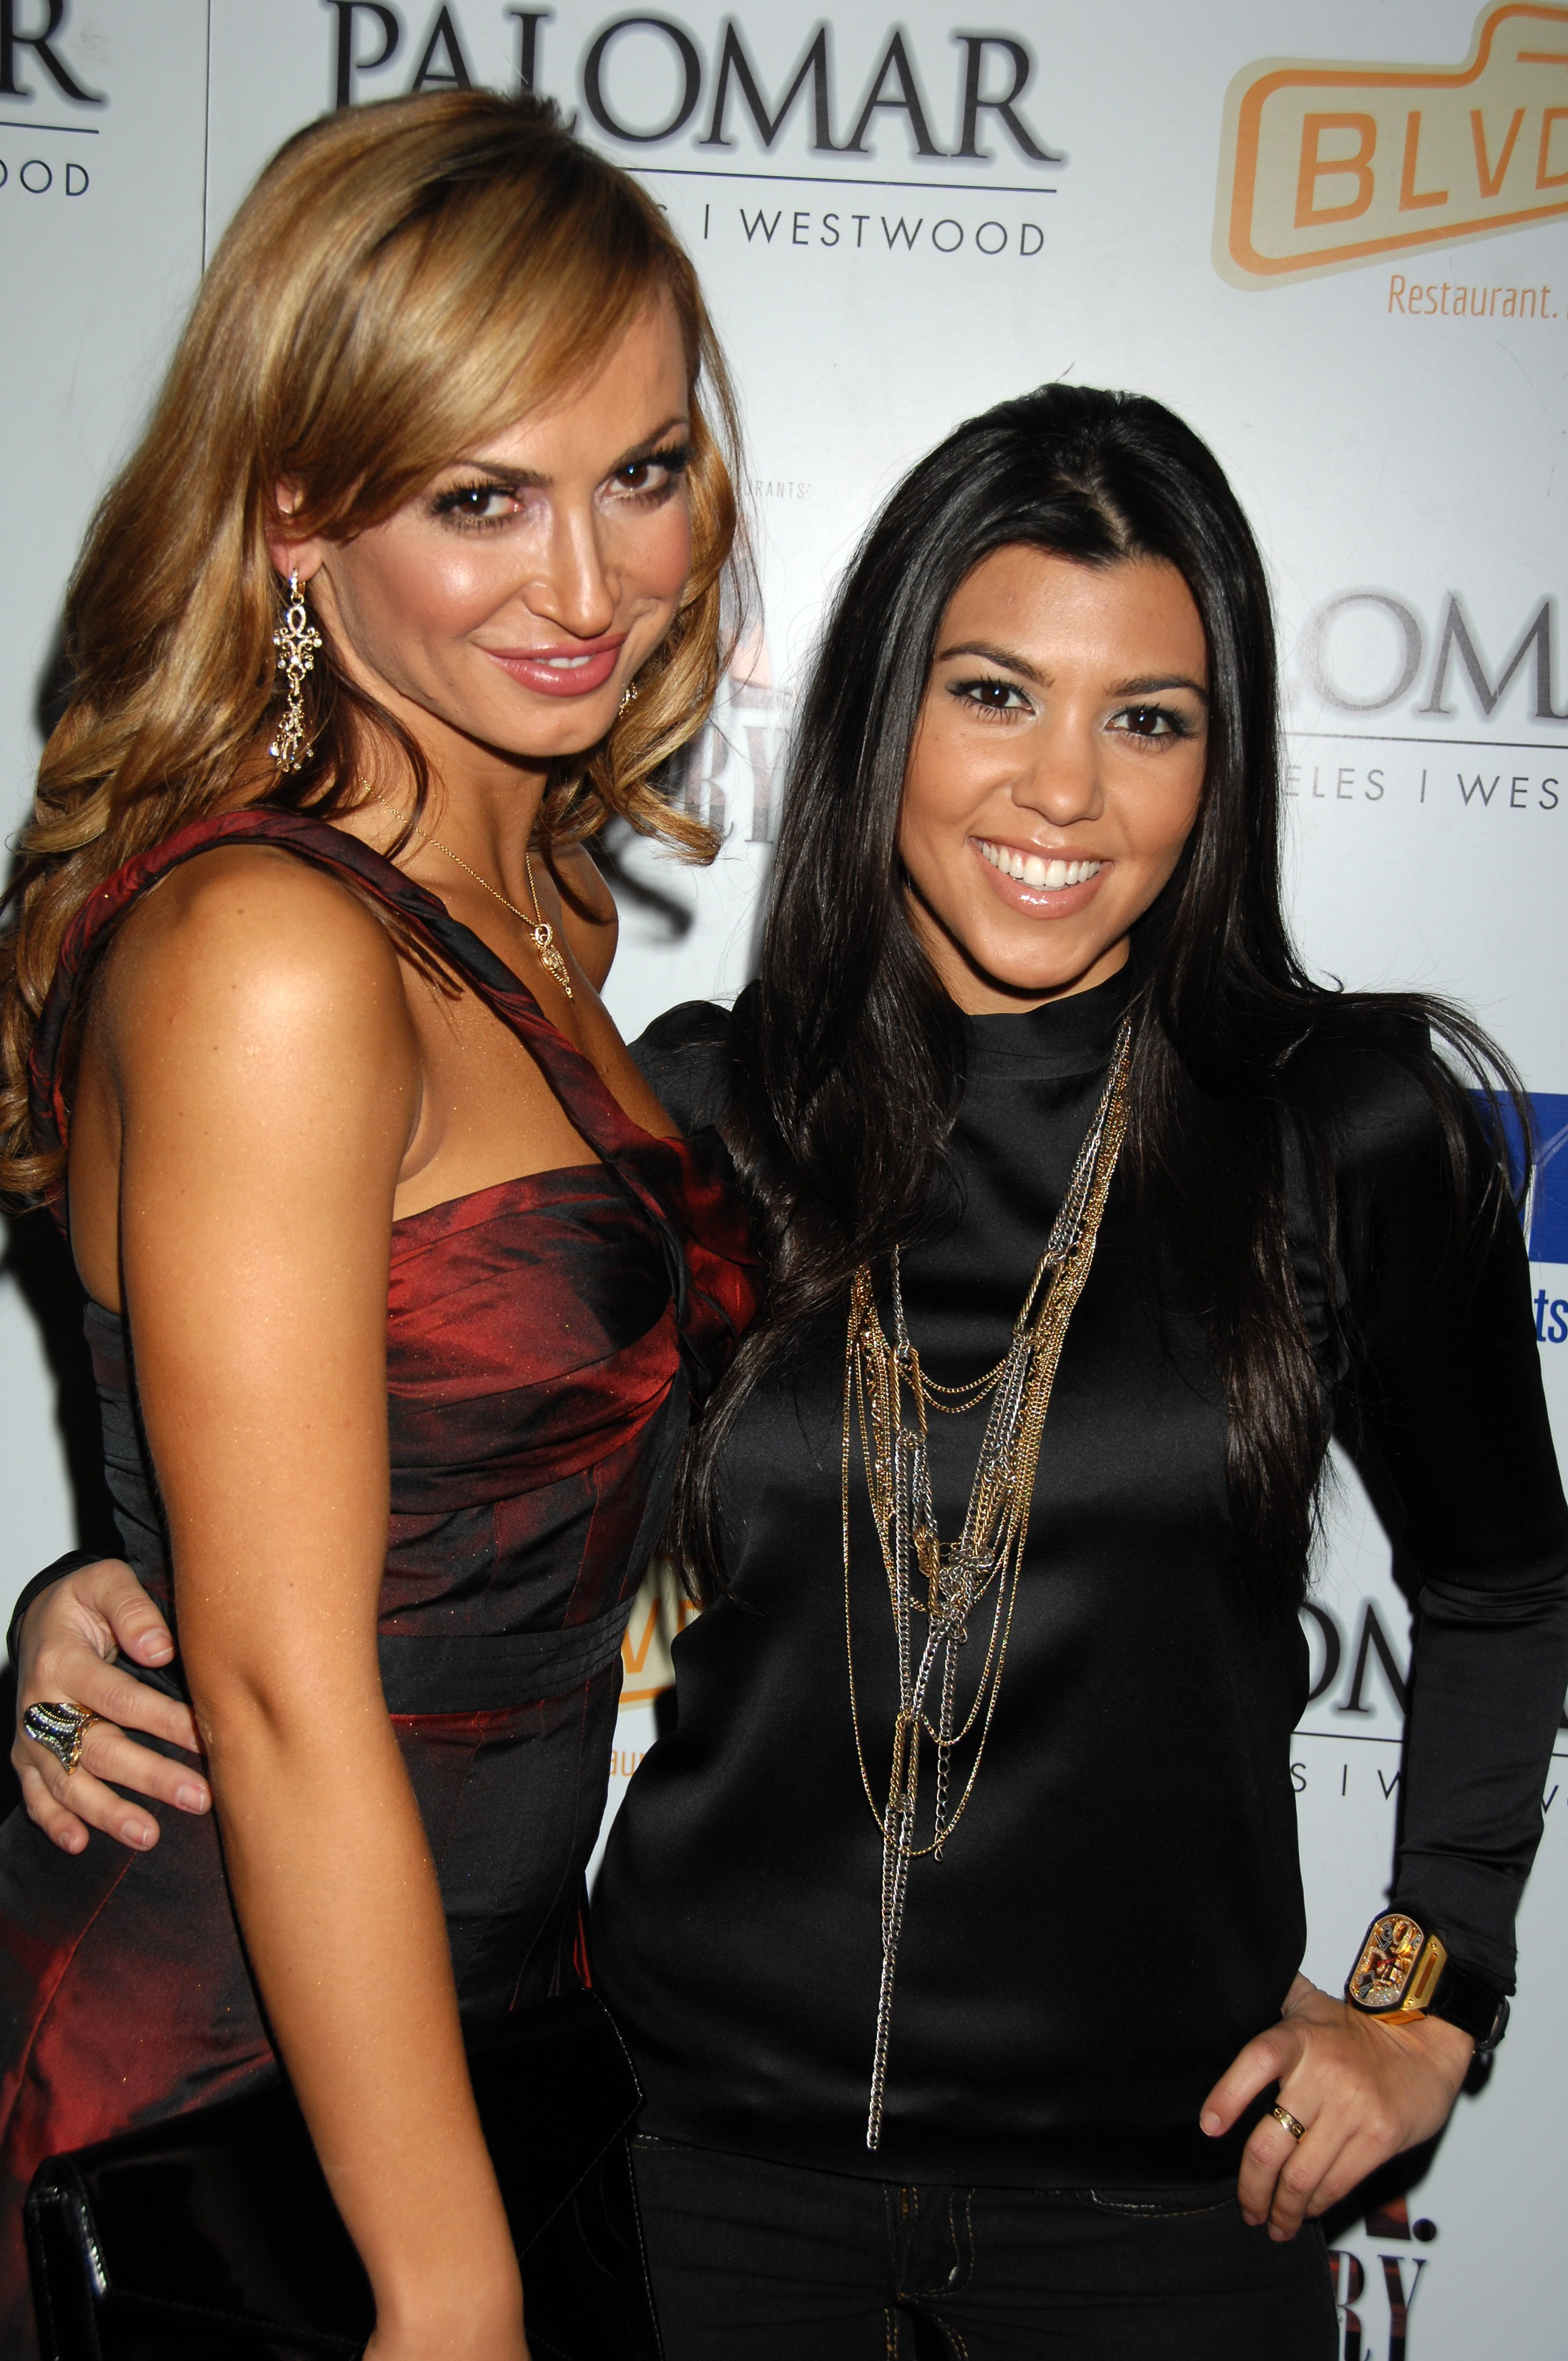 03340_Kim_Kardashian_2008-12-08_-_A_Night_For_Change_benefiting_Alternative_Intervention_Models_in_LA_890_122_595lo.jpg